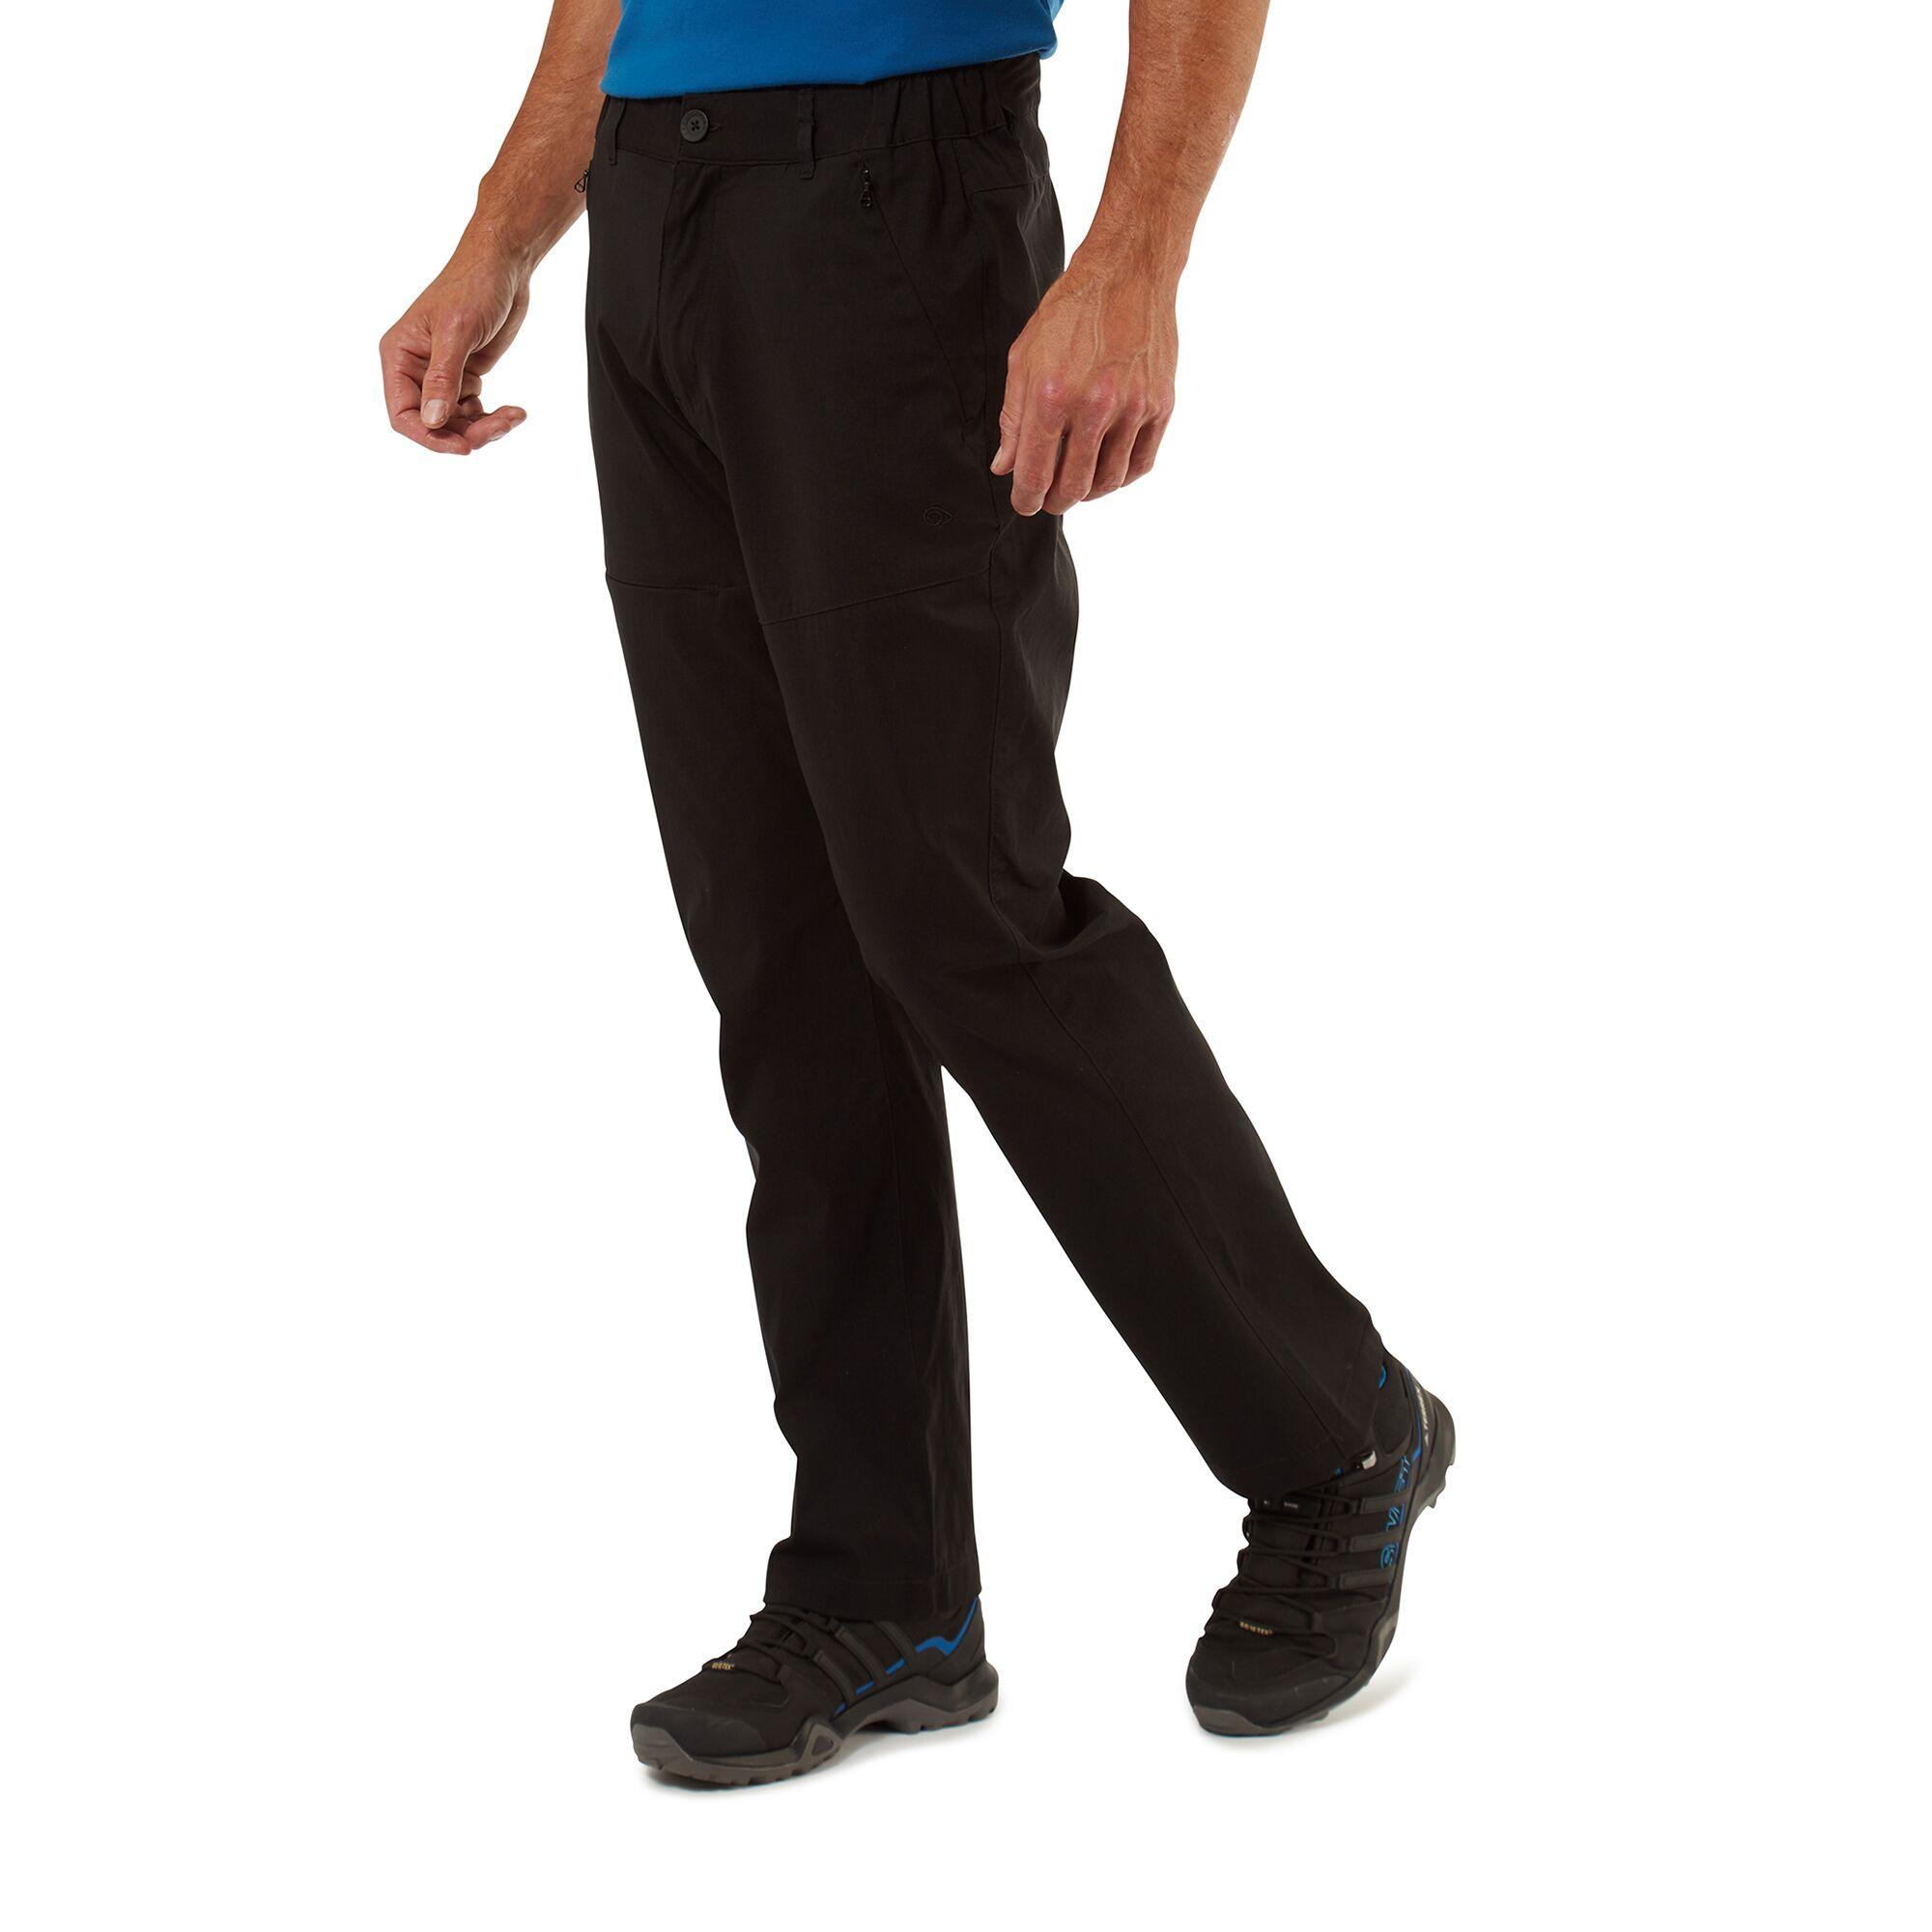 Craghoppers Mens Classic Kiwi Trousers - Bark - 32l